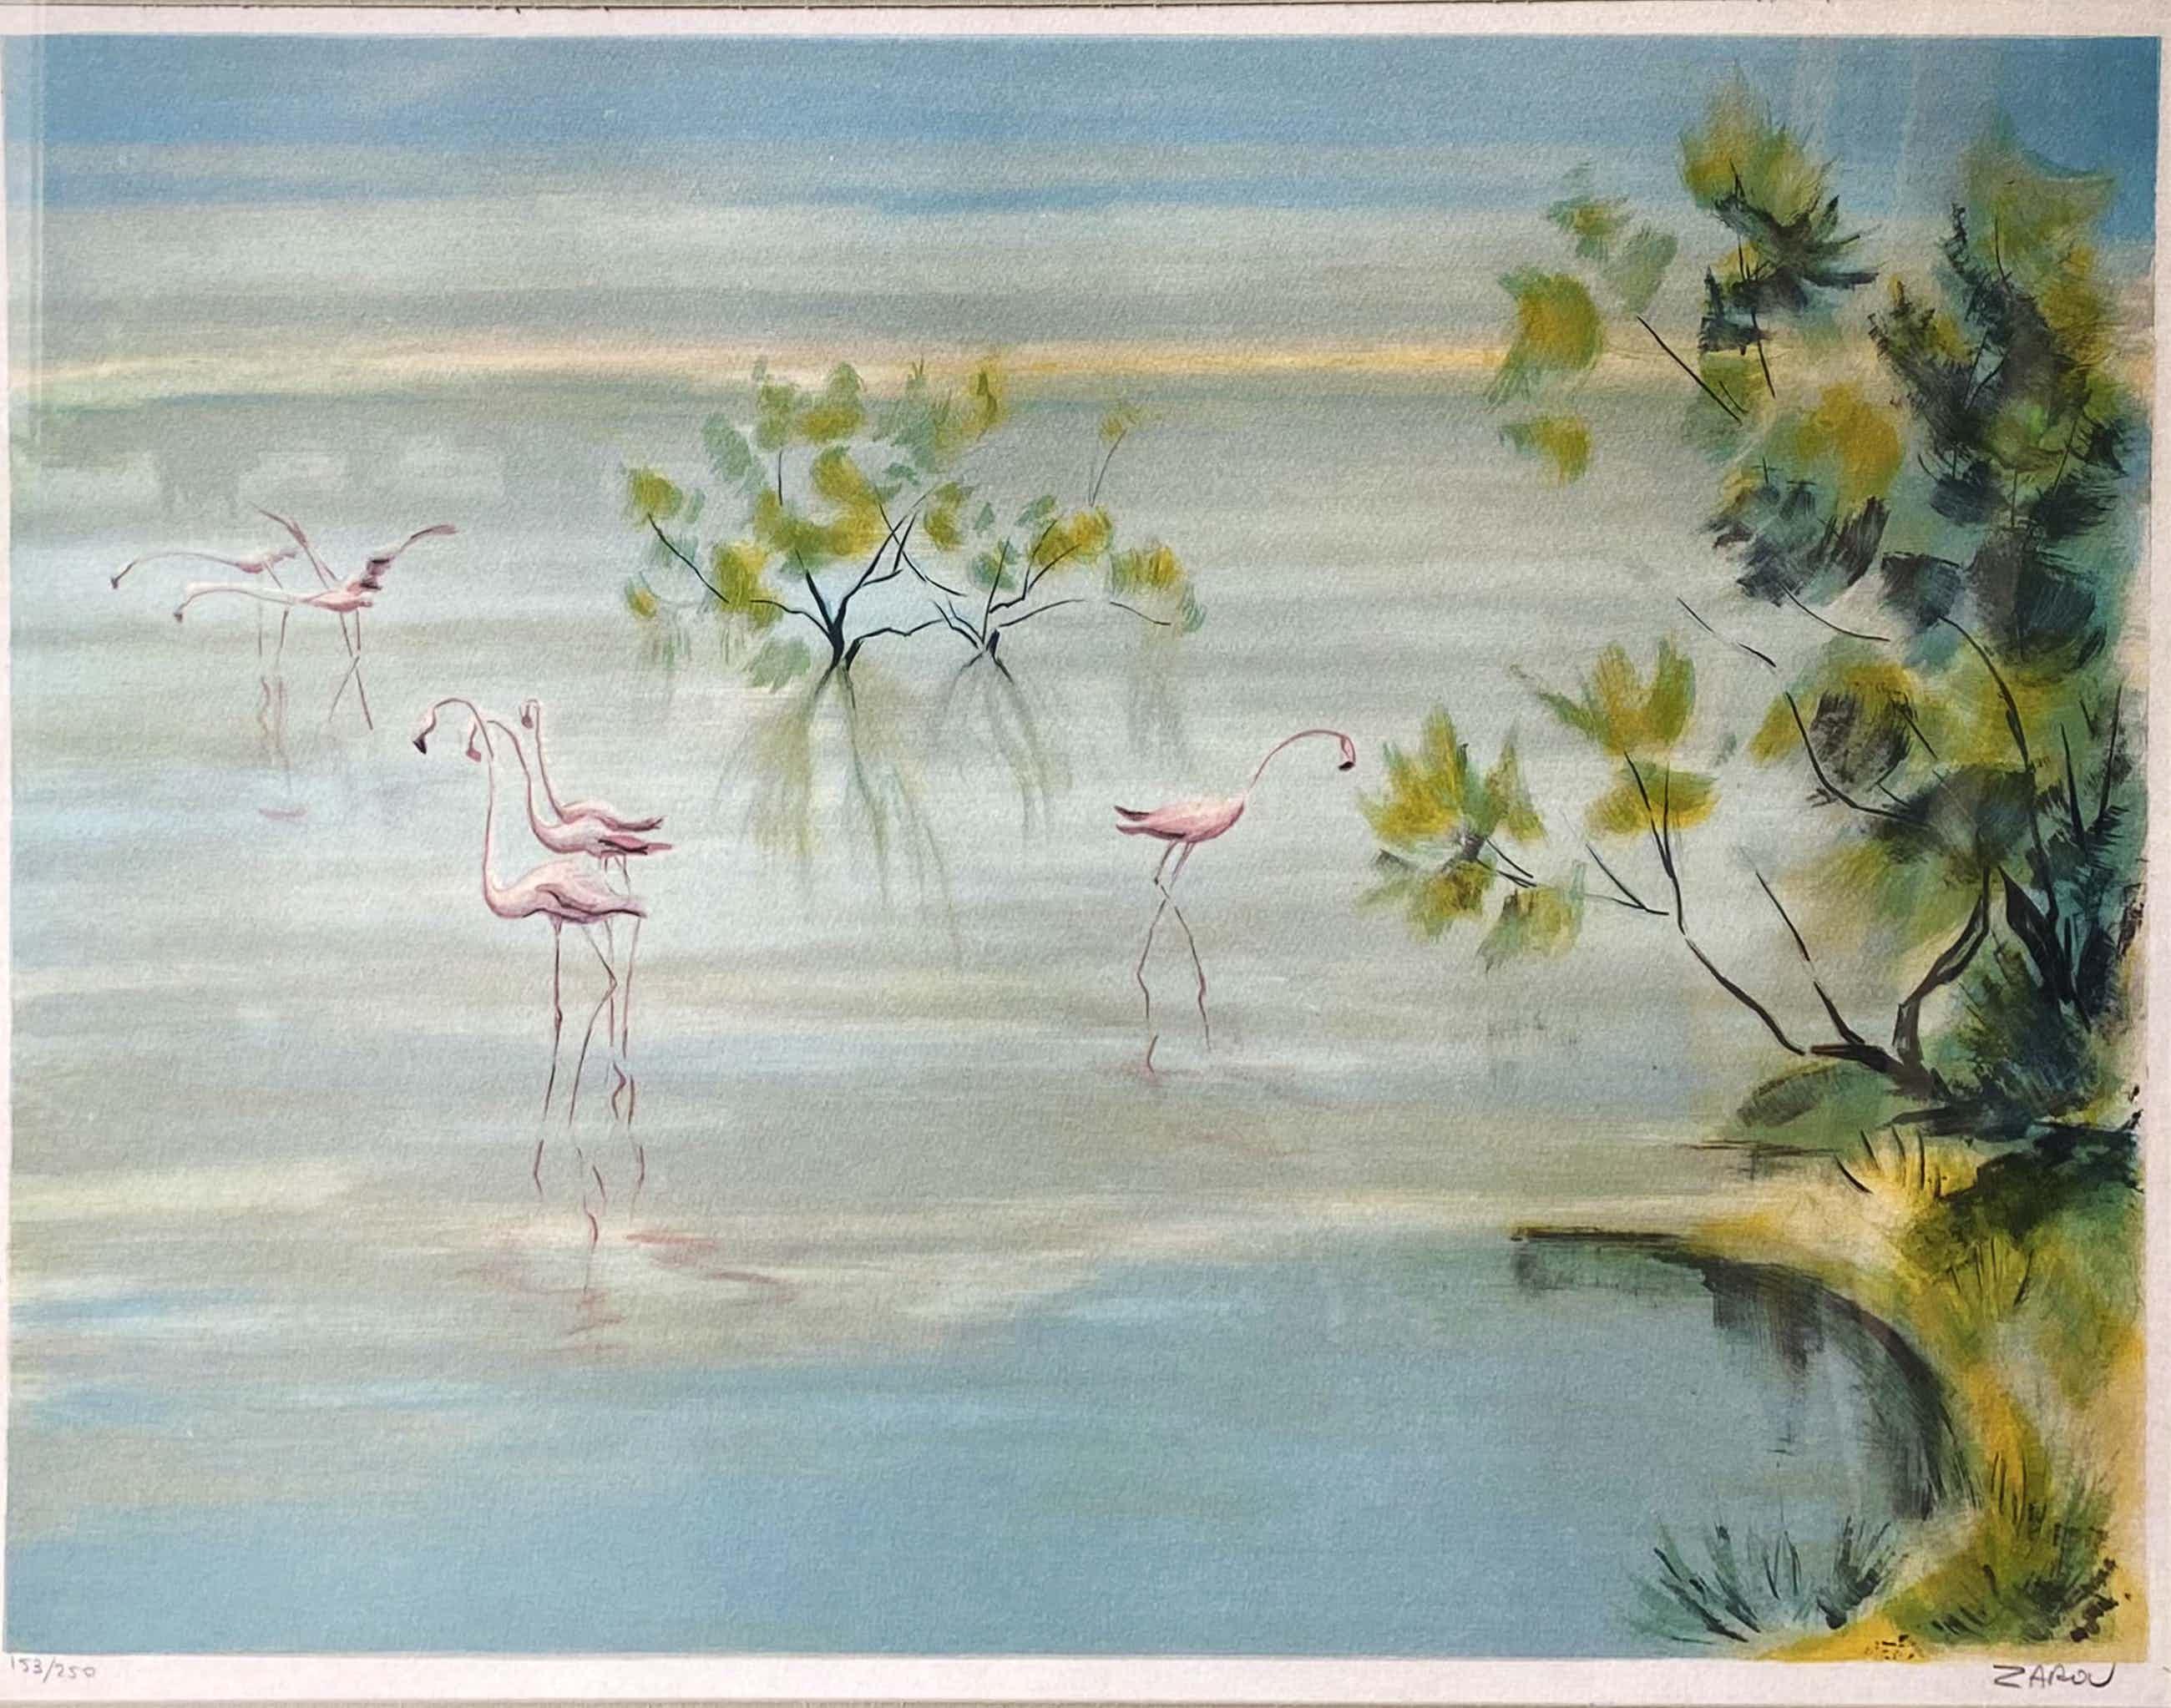 Gerard Cardella Zarou - C1863 - Les Flamants Roses kopen? Bied vanaf 25!